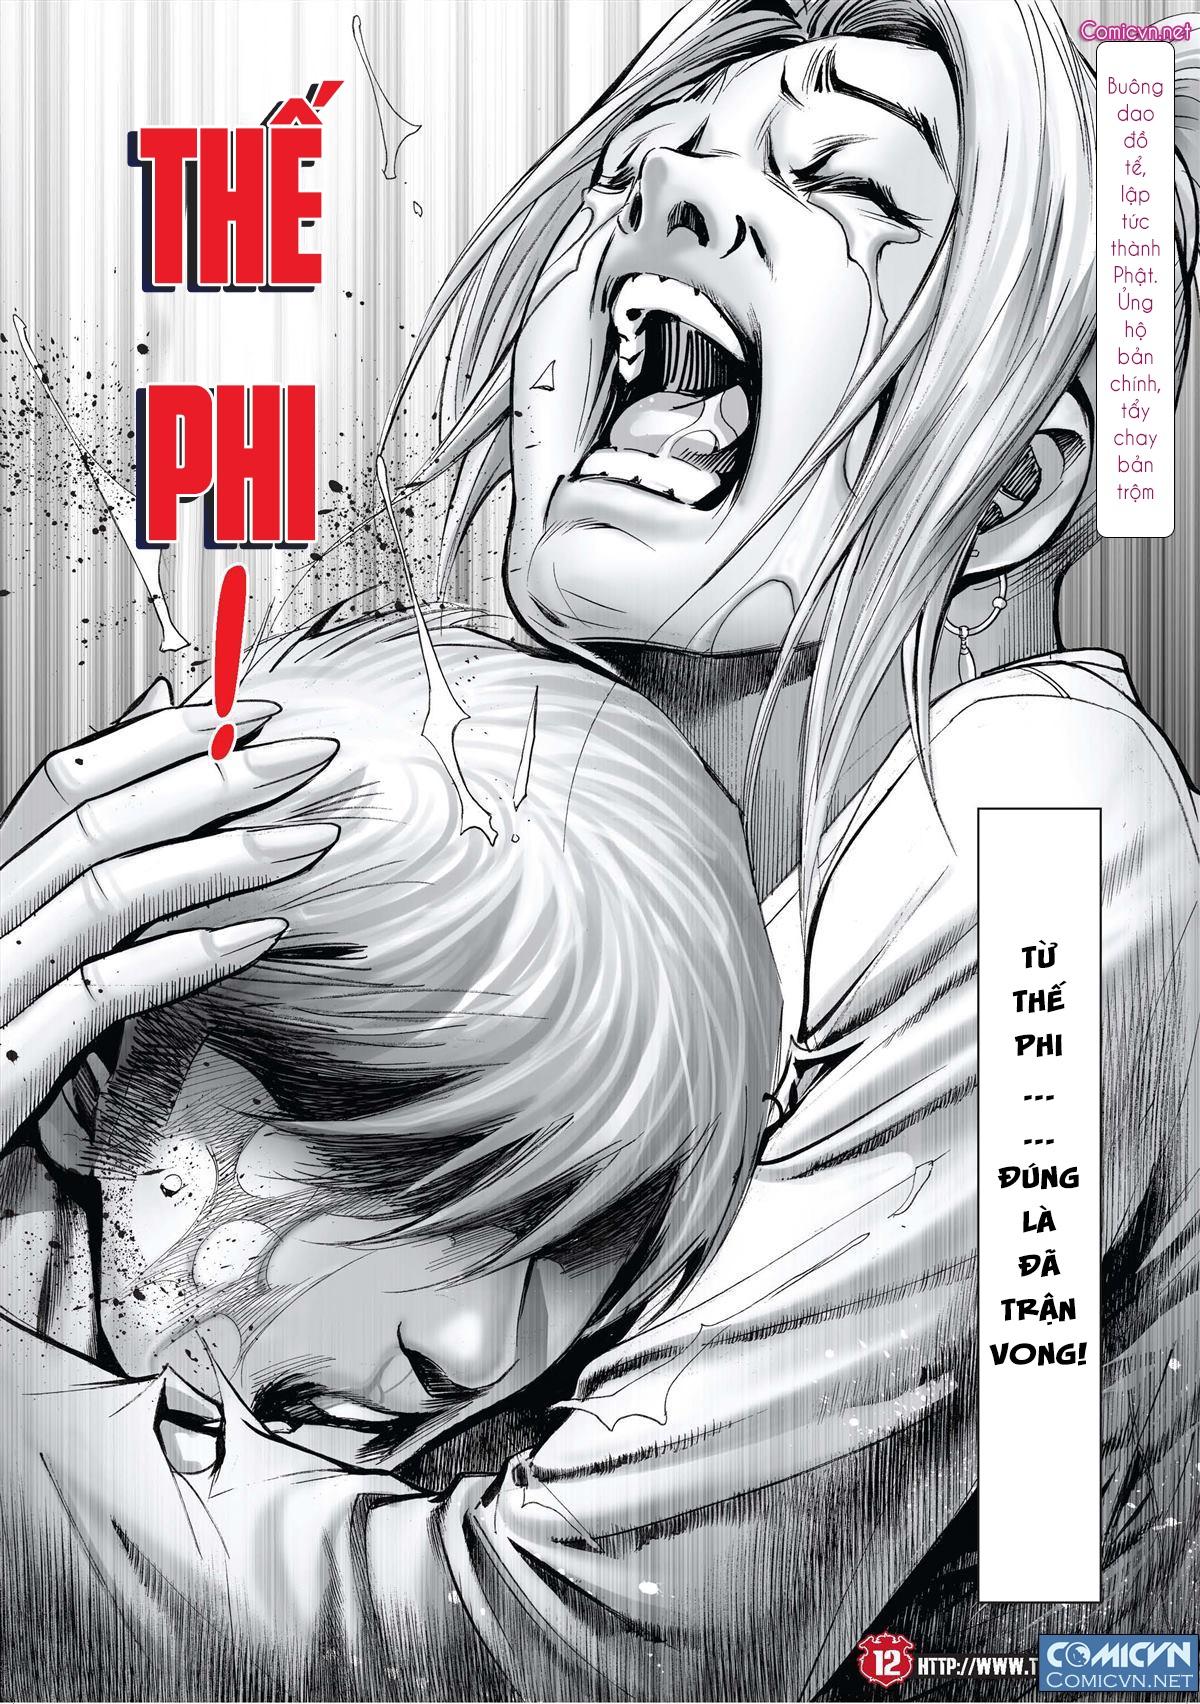 Người Trong Giang Hồ chapter 2001: tự tận trang 11